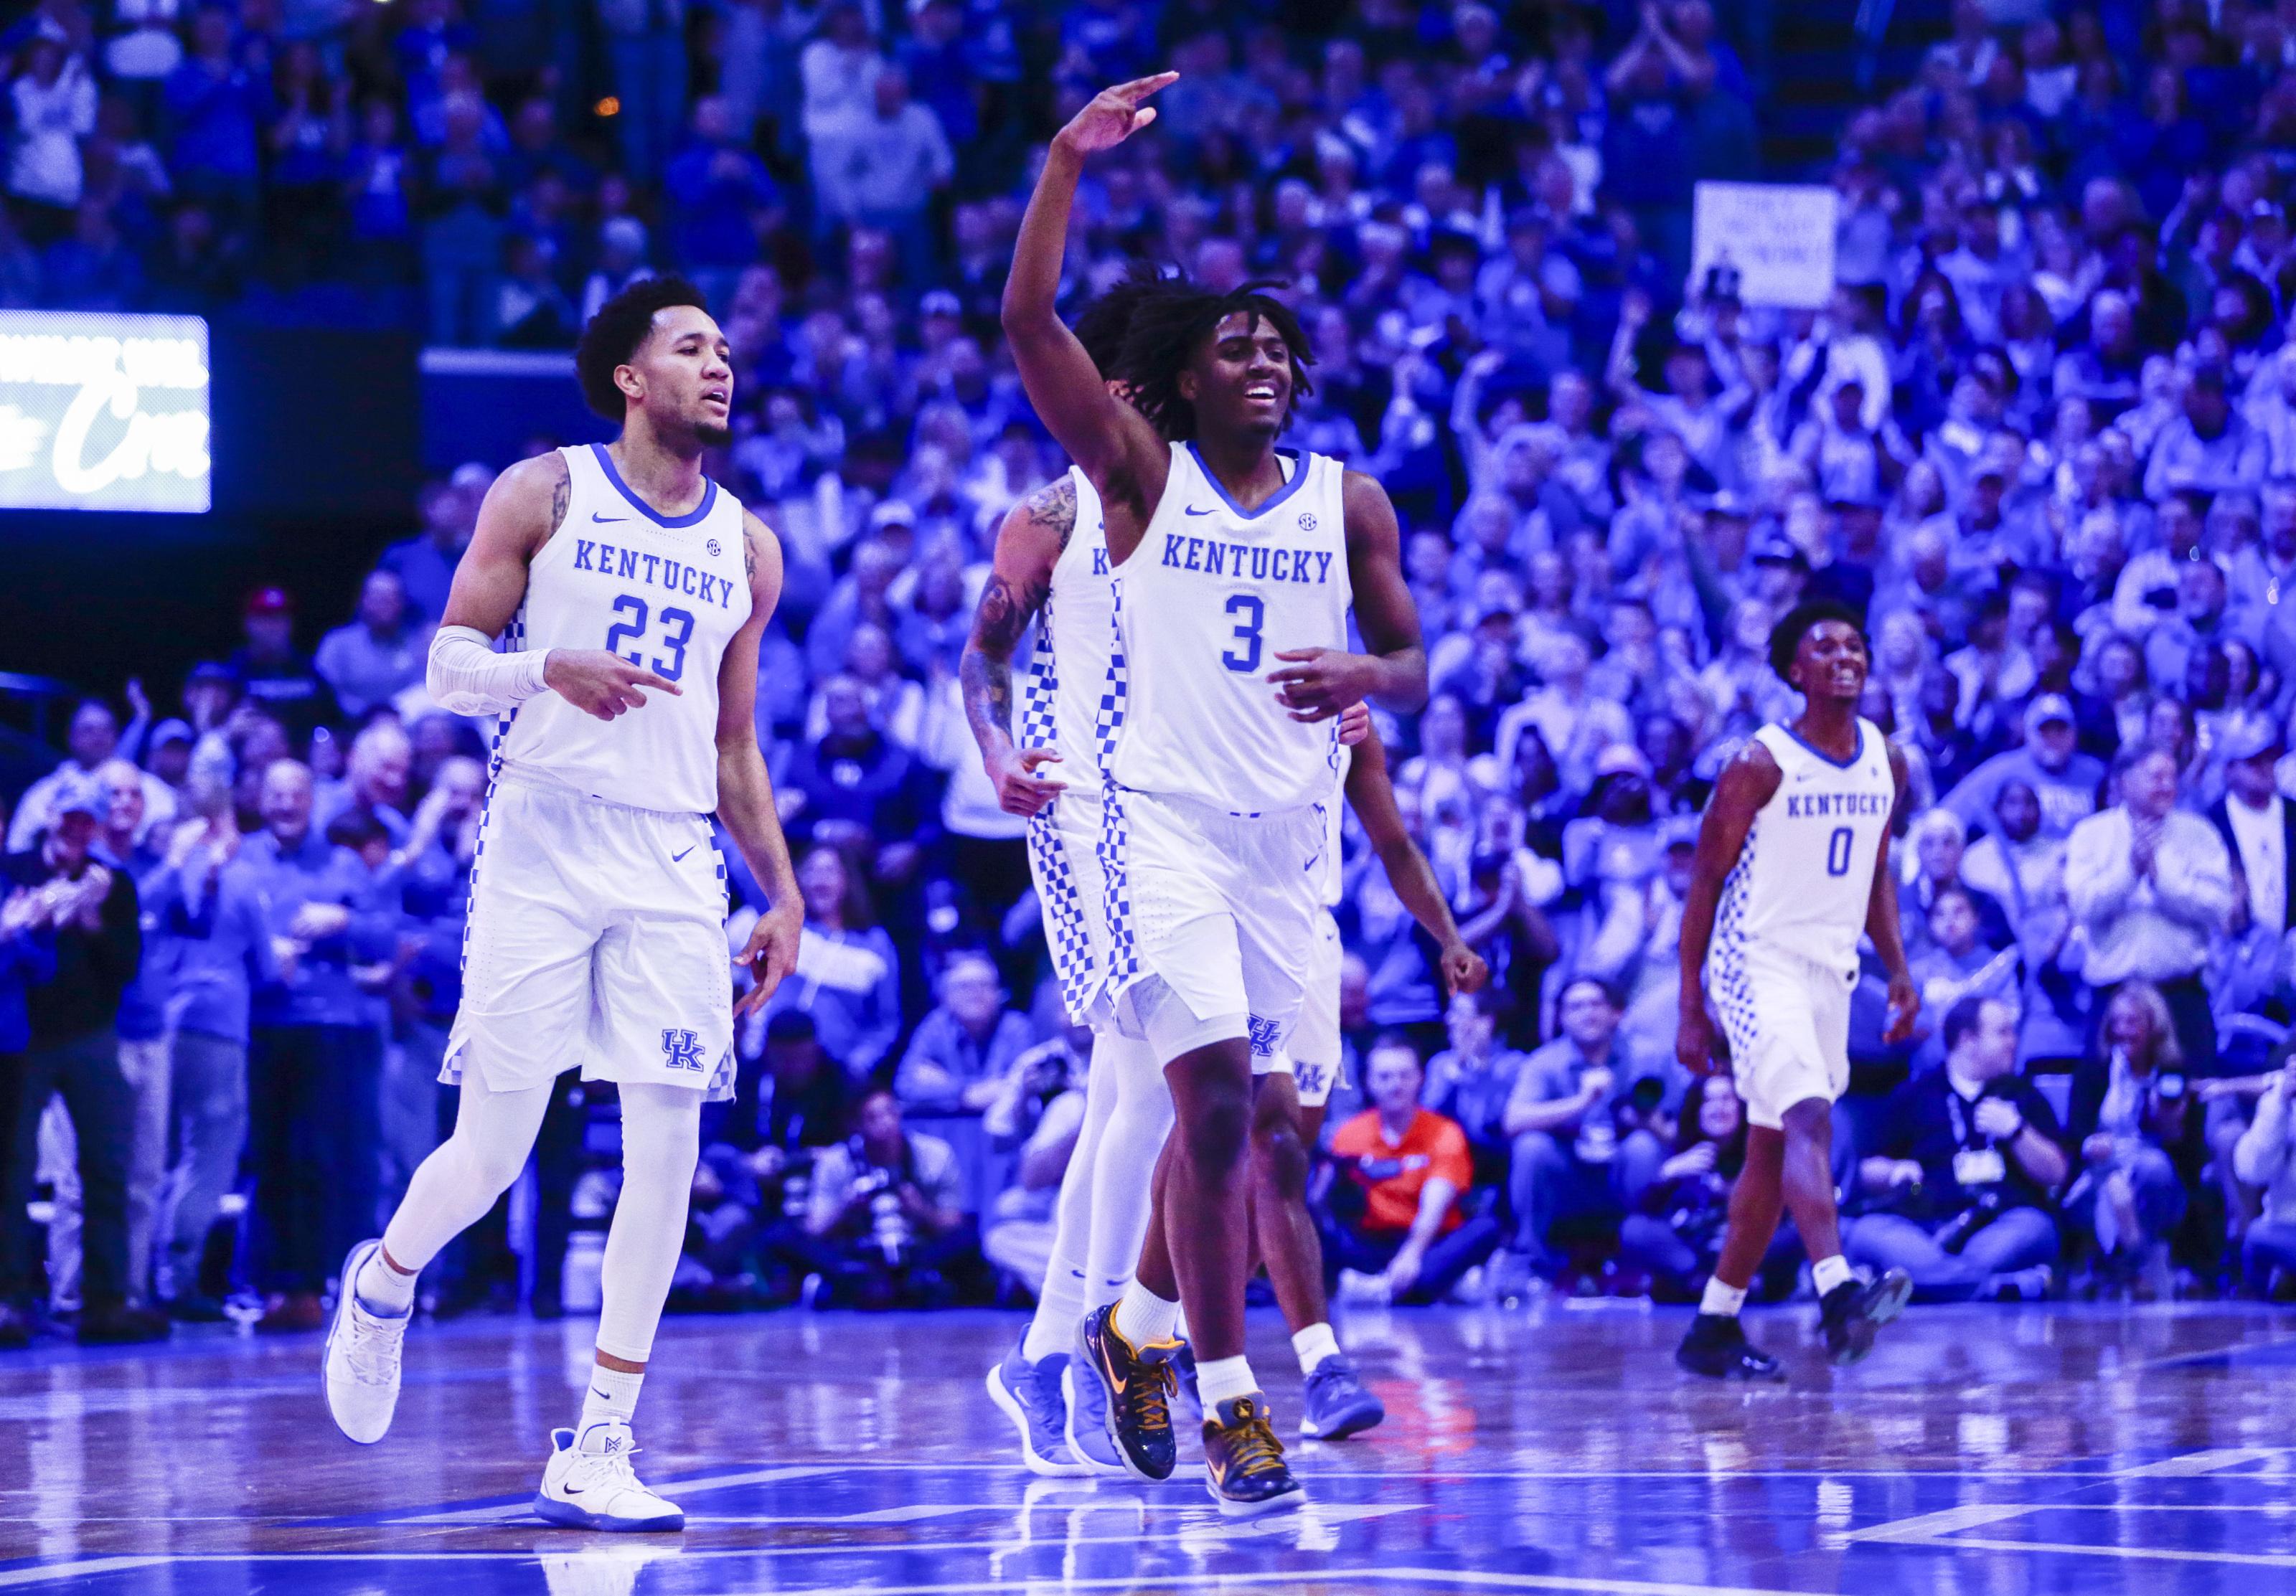 NCAA Basketball: Mock 2020 NCAA Tournament Elite 8 predictions